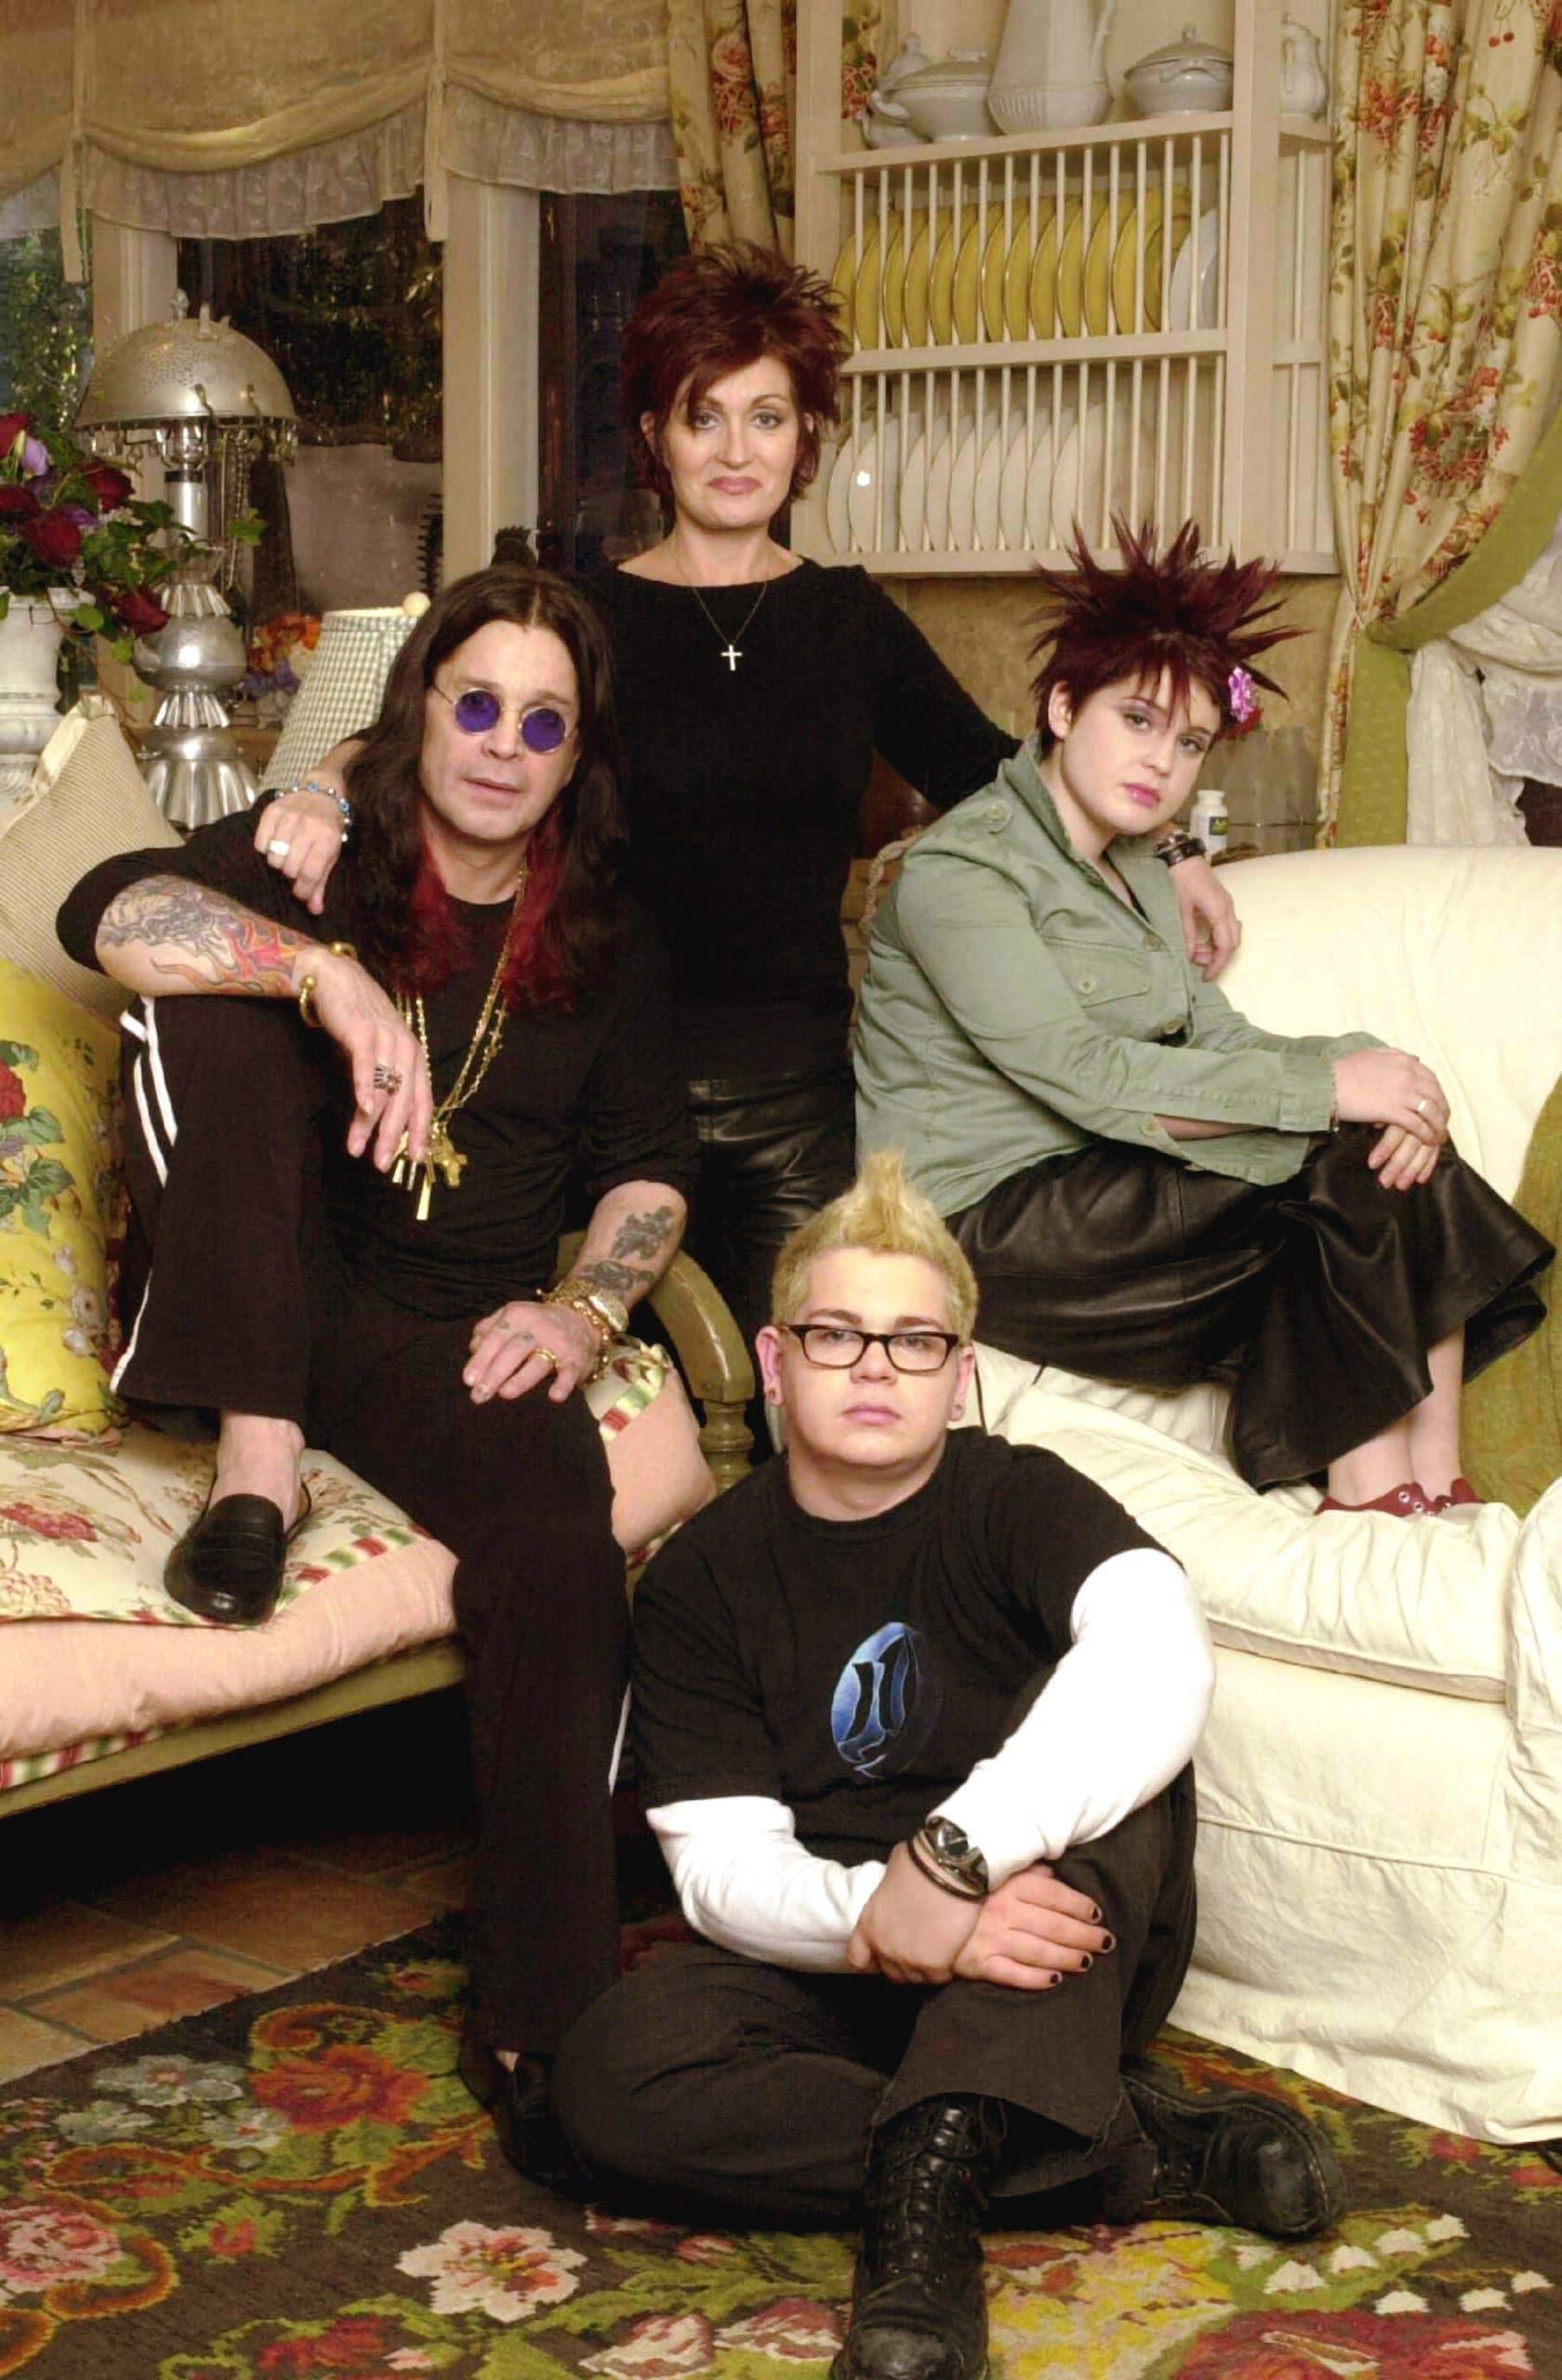 THE OSBOURNES, Ozzy Osbourne, Sharon Osbourne, Kelly Osbourne, Jack Osbourne